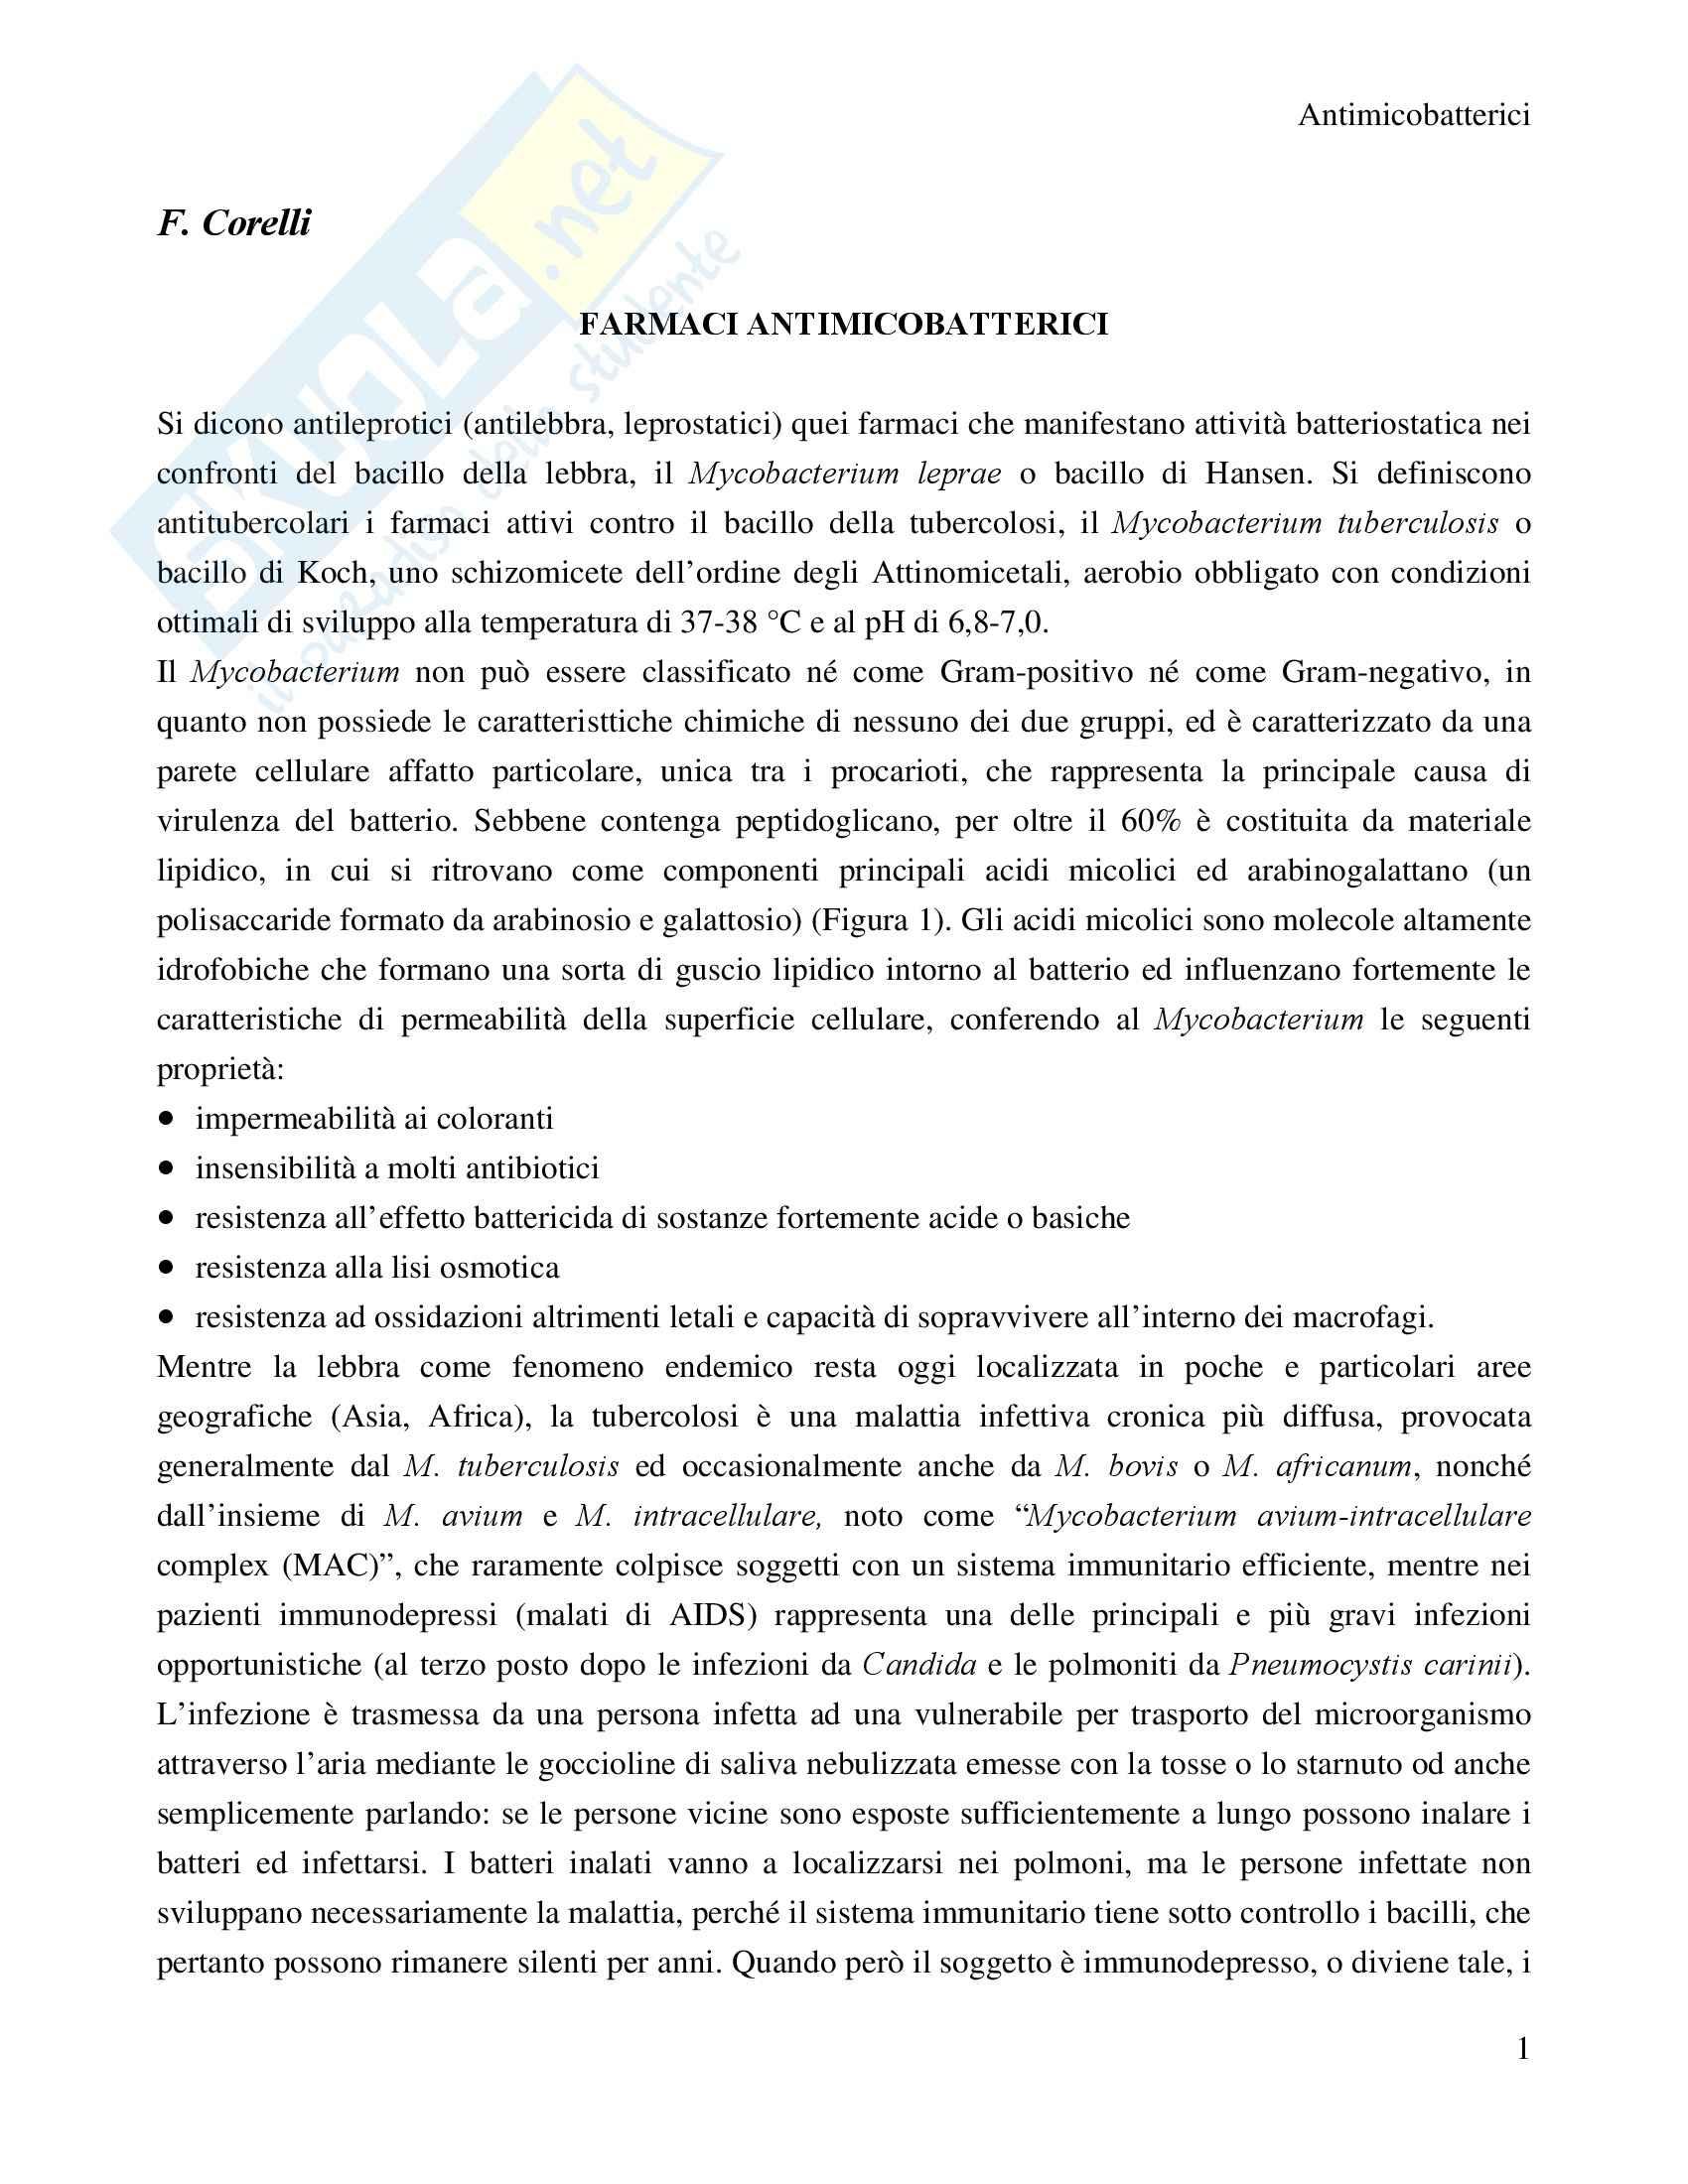 Chimica farmaceutica - farmaci antimicobatterici